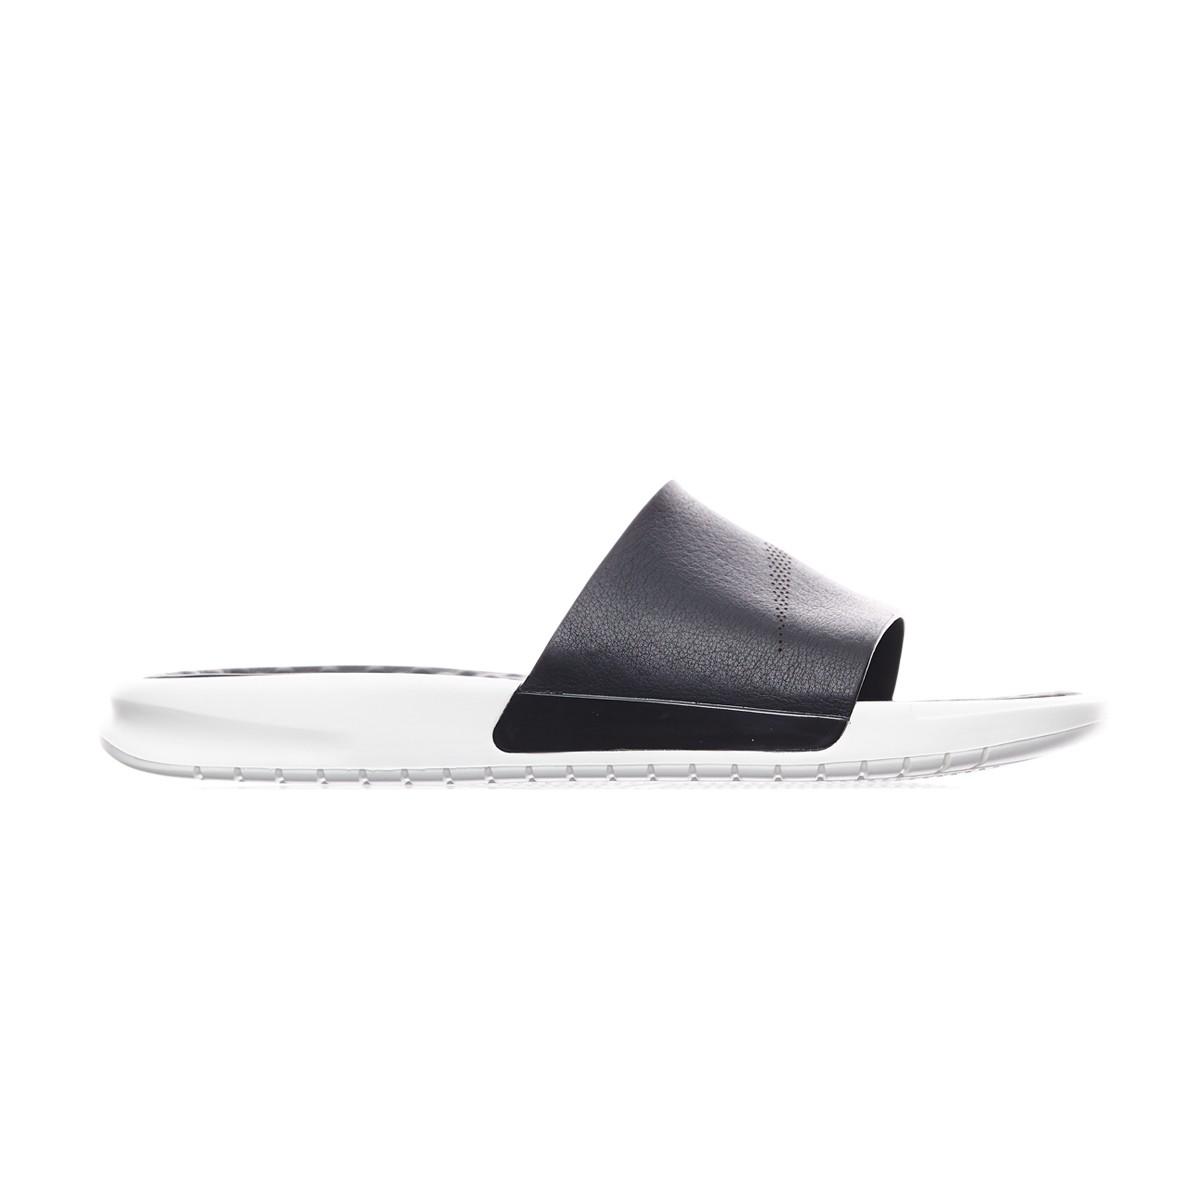 8a8ac29a1 Lyst - Nike Benassi Lux Slides Qs in Black for Men